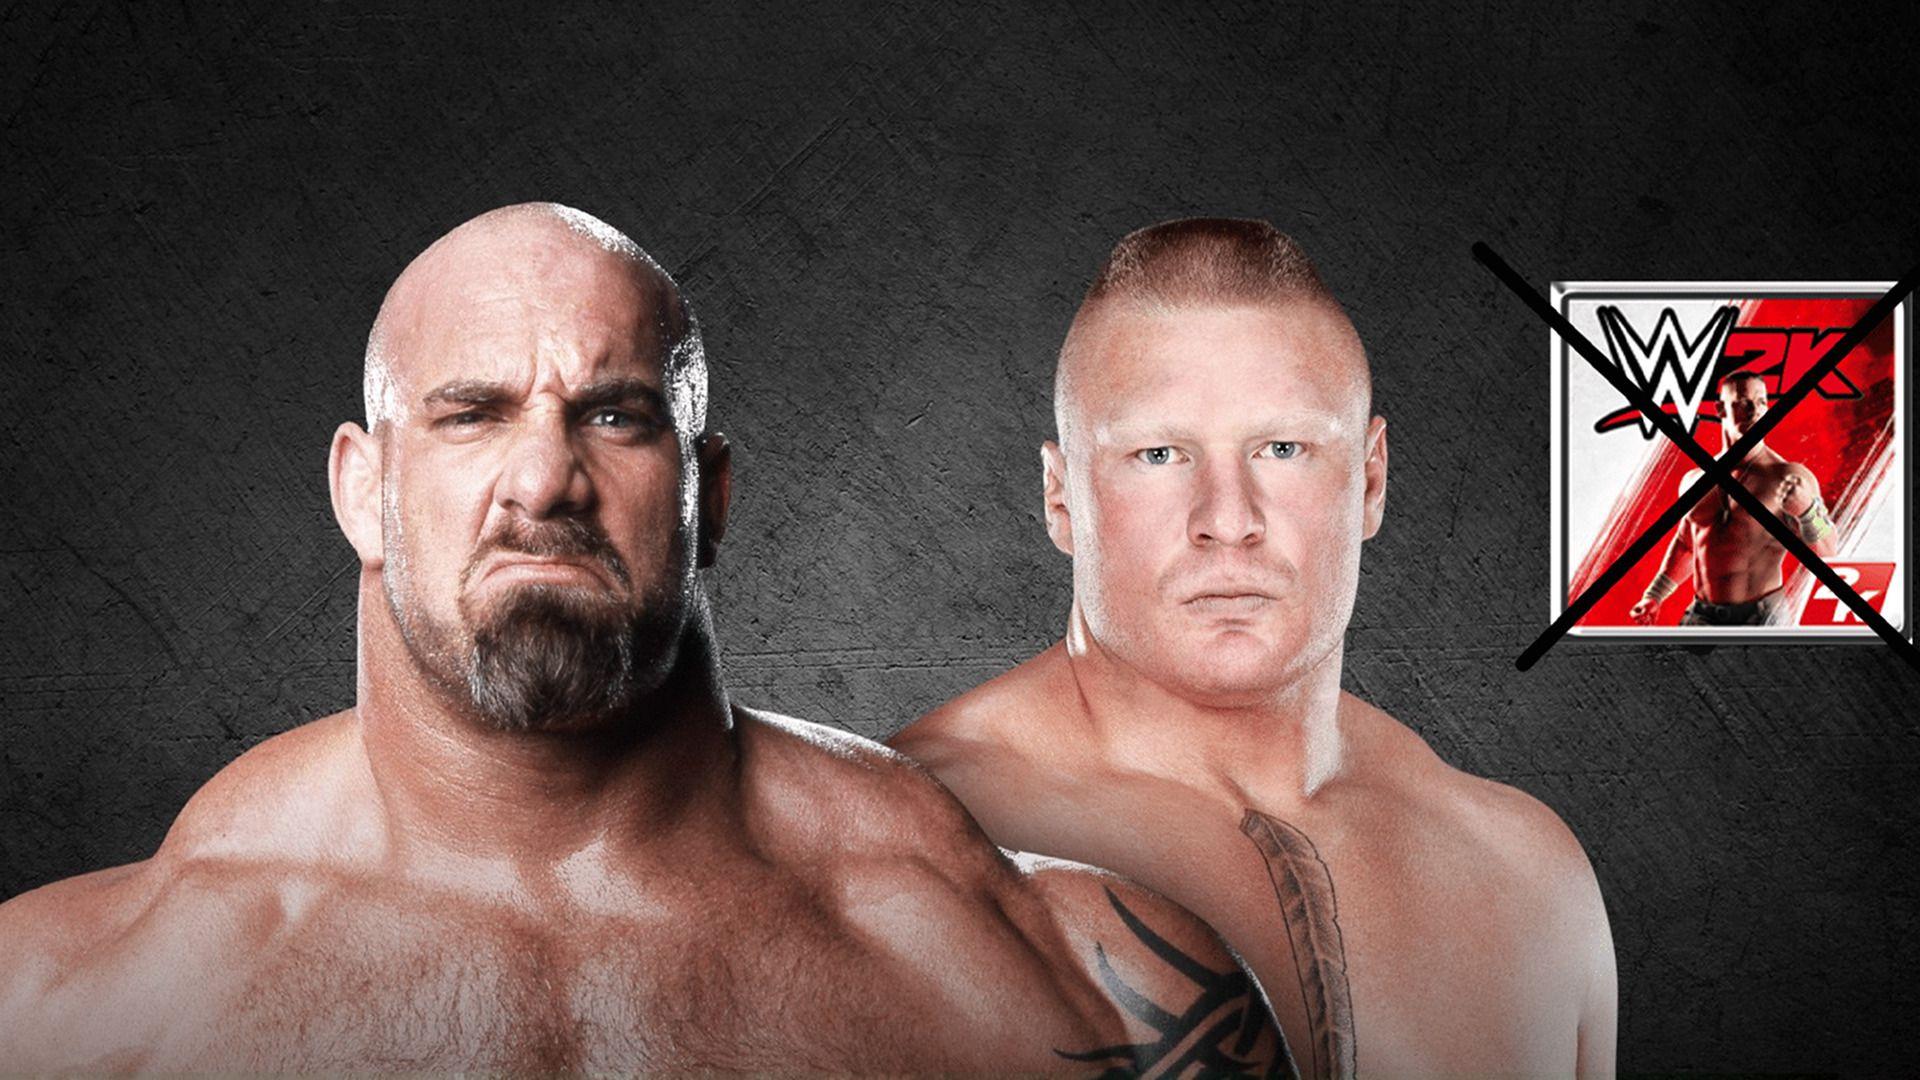 WWE 2k wrestling games